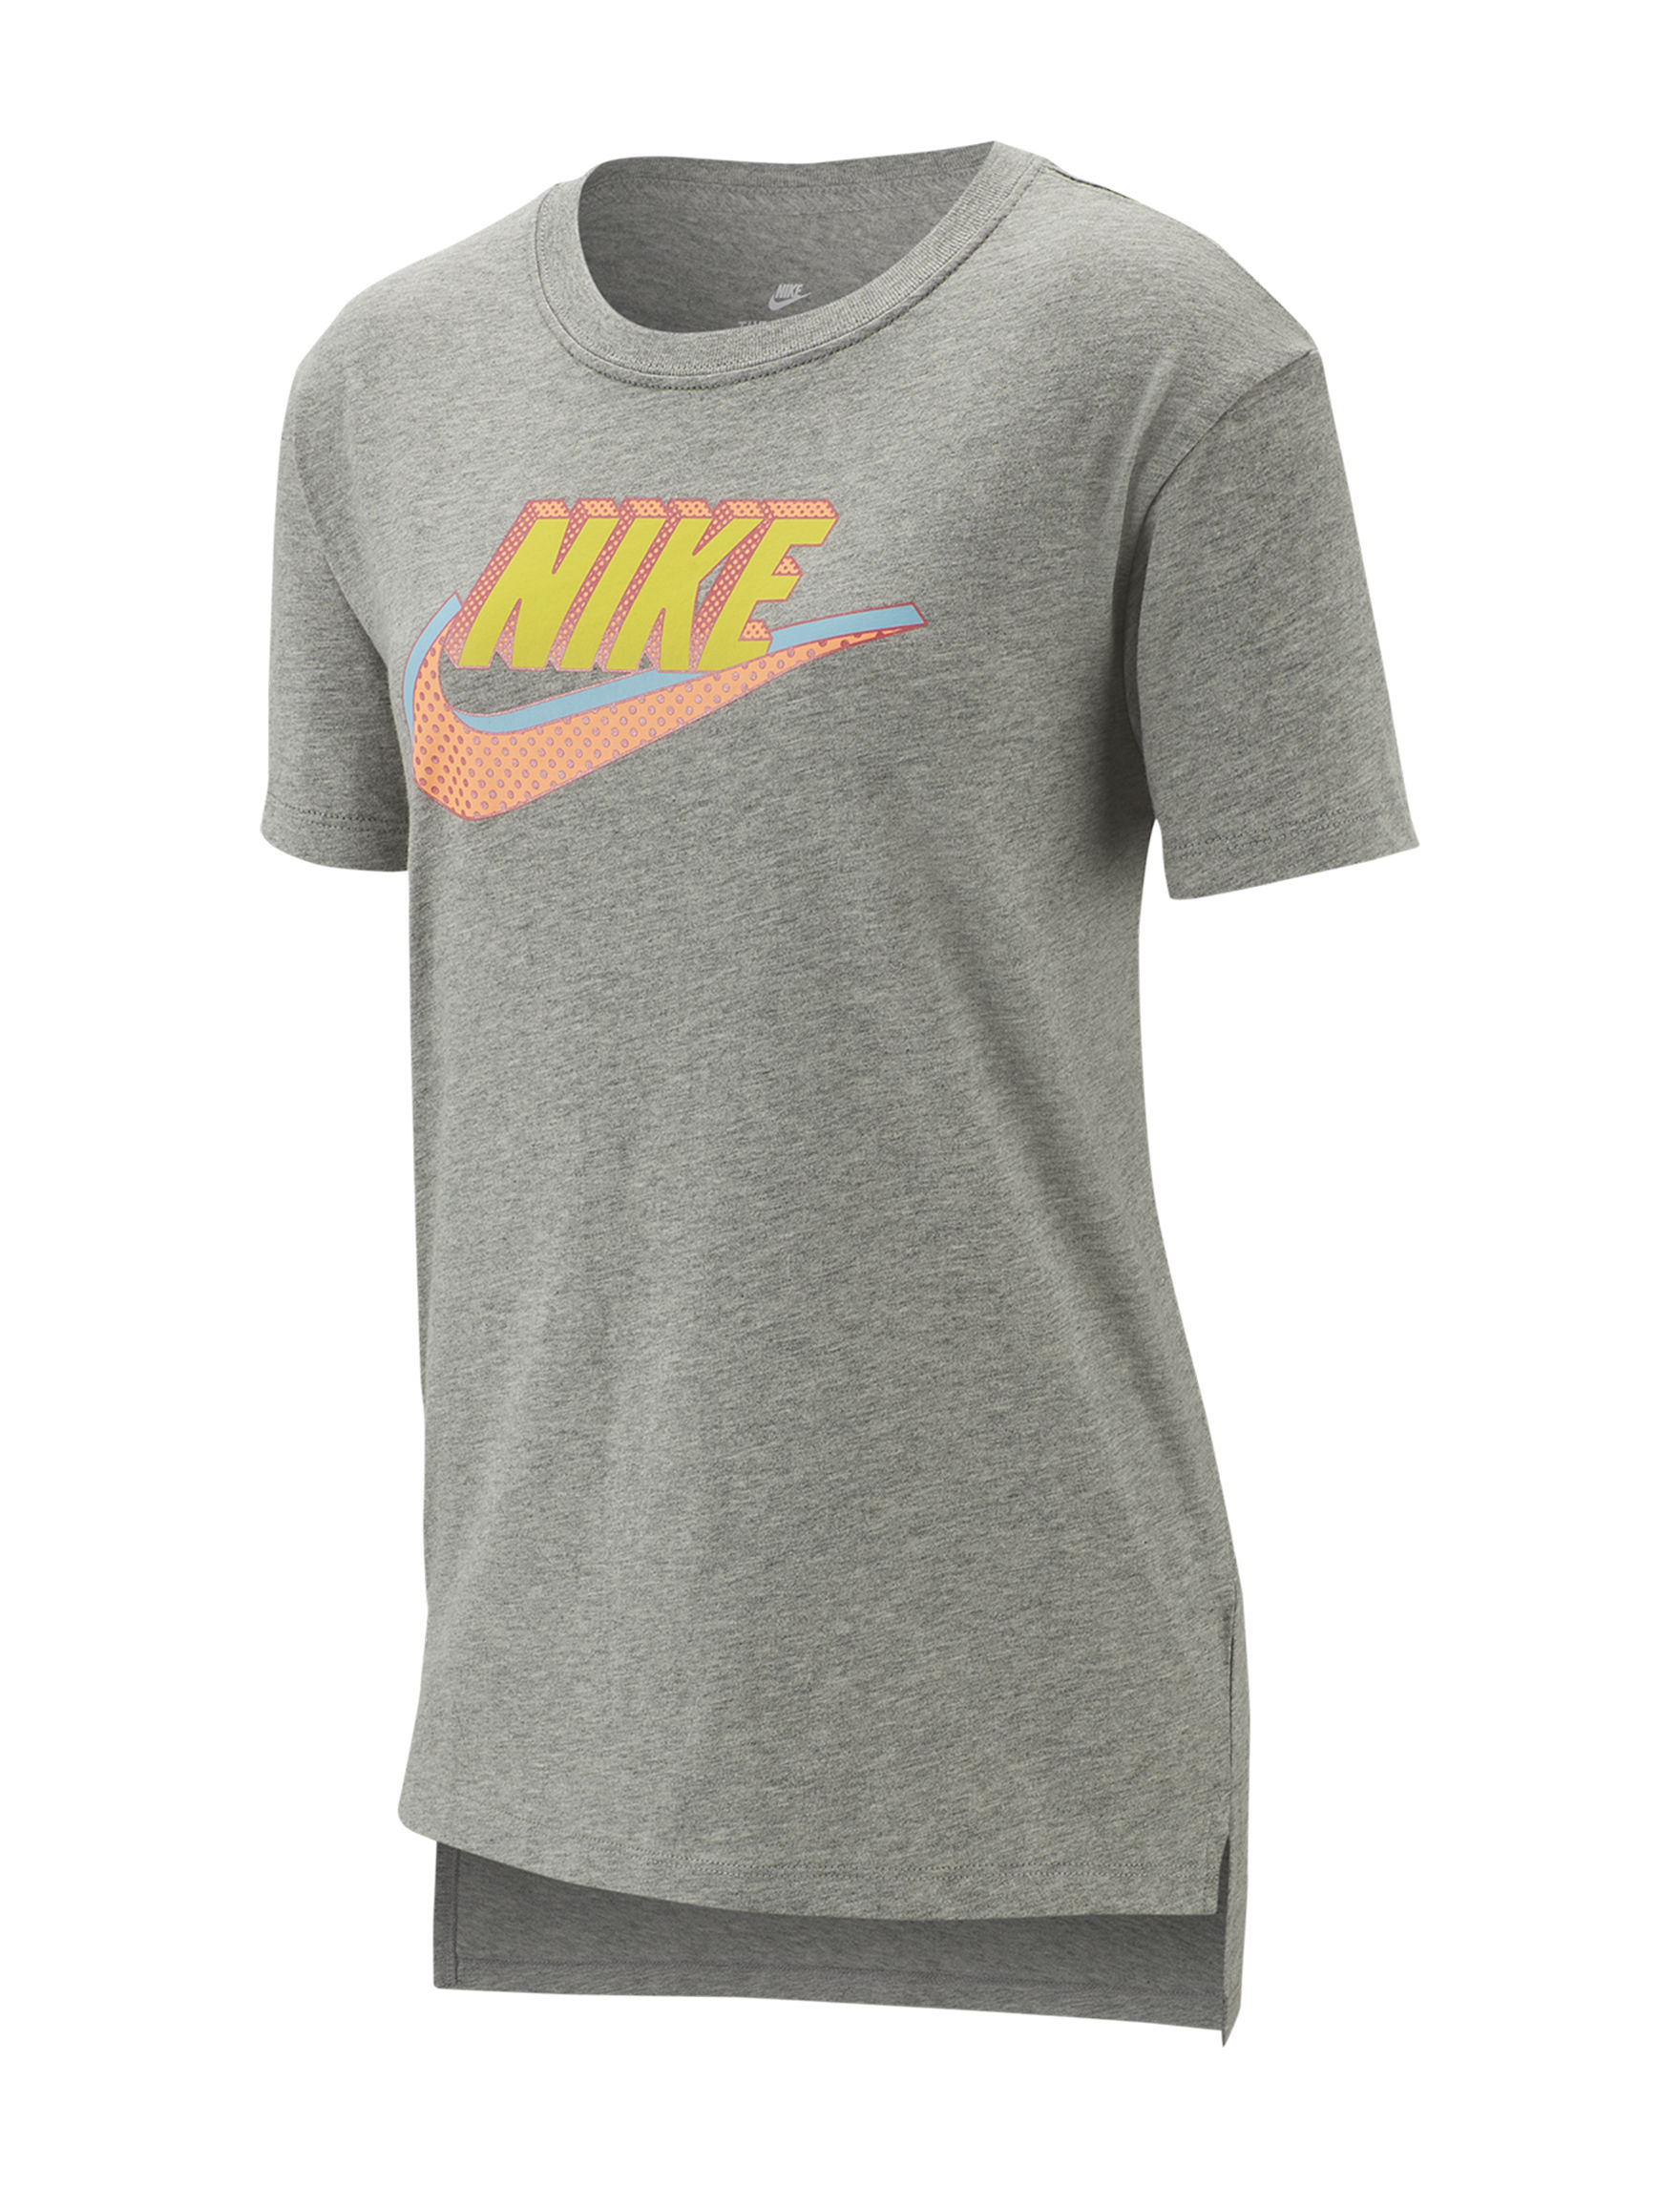 Nike Heather Grey Tees & Tanks